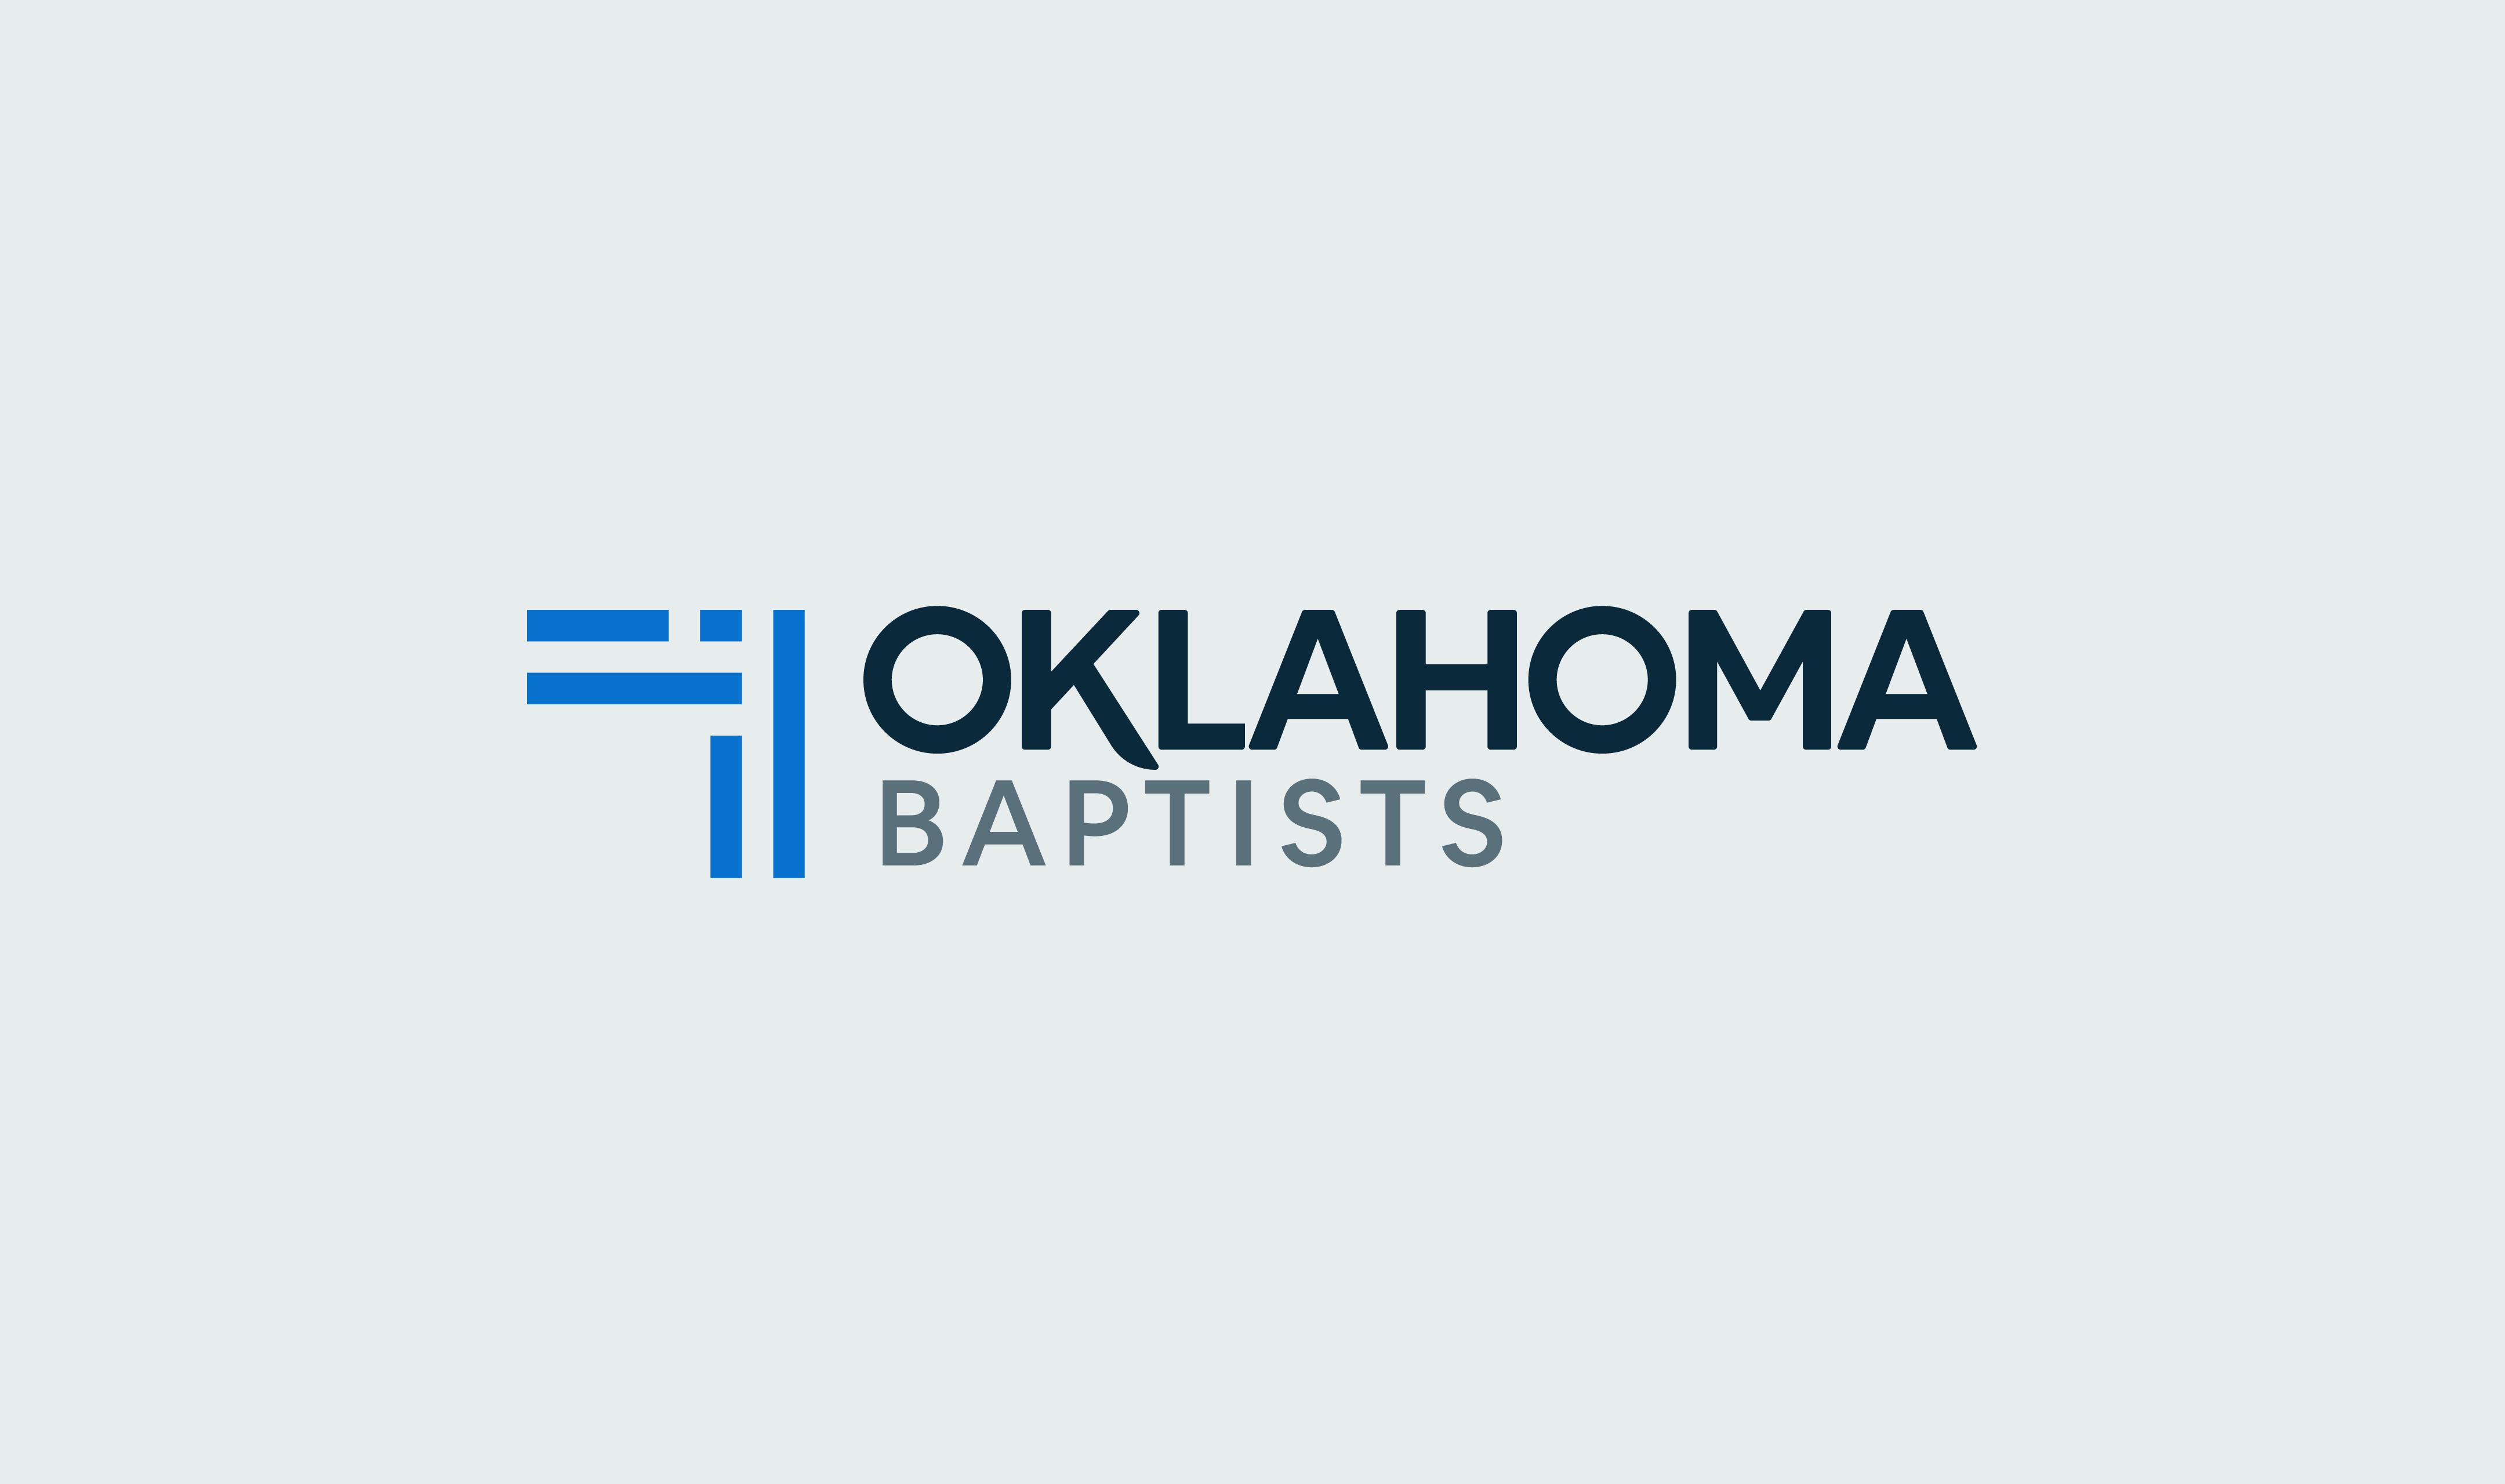 The new identity mark of the Oklahoma Baptist Convention